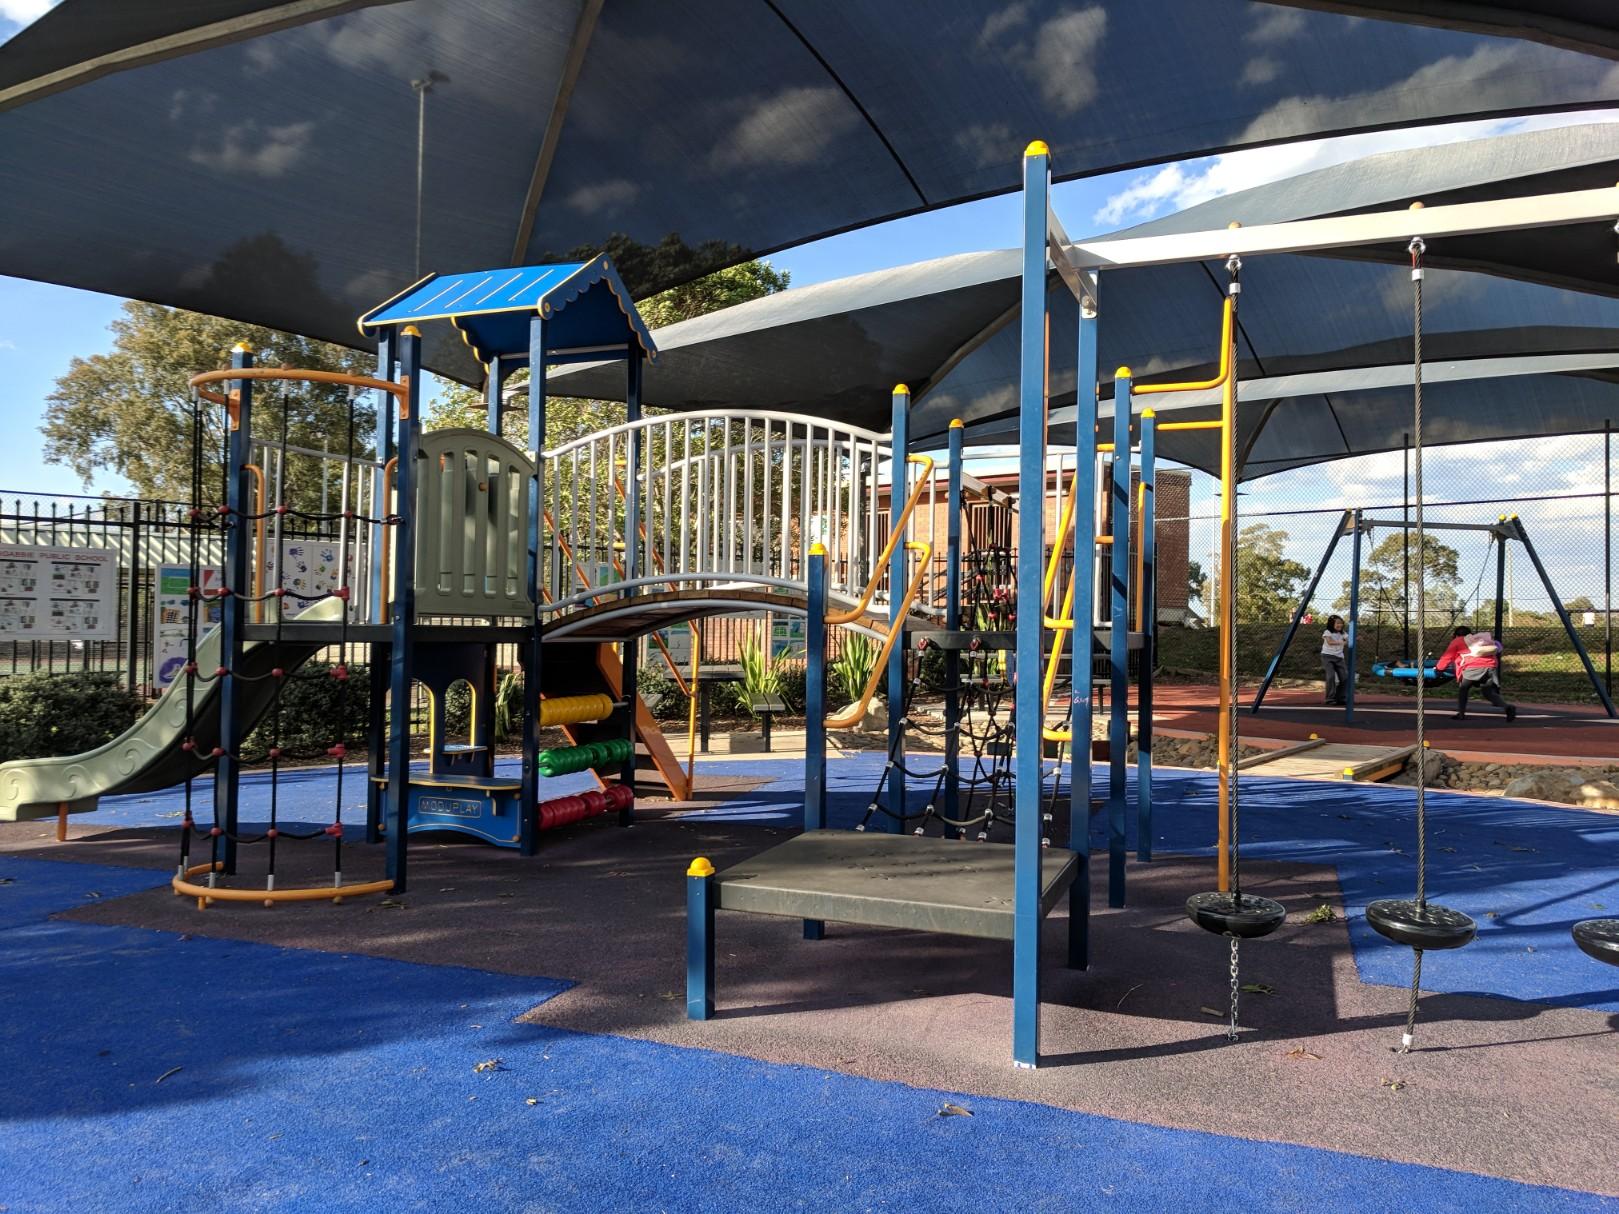 Binalong Park Old Toongabbie